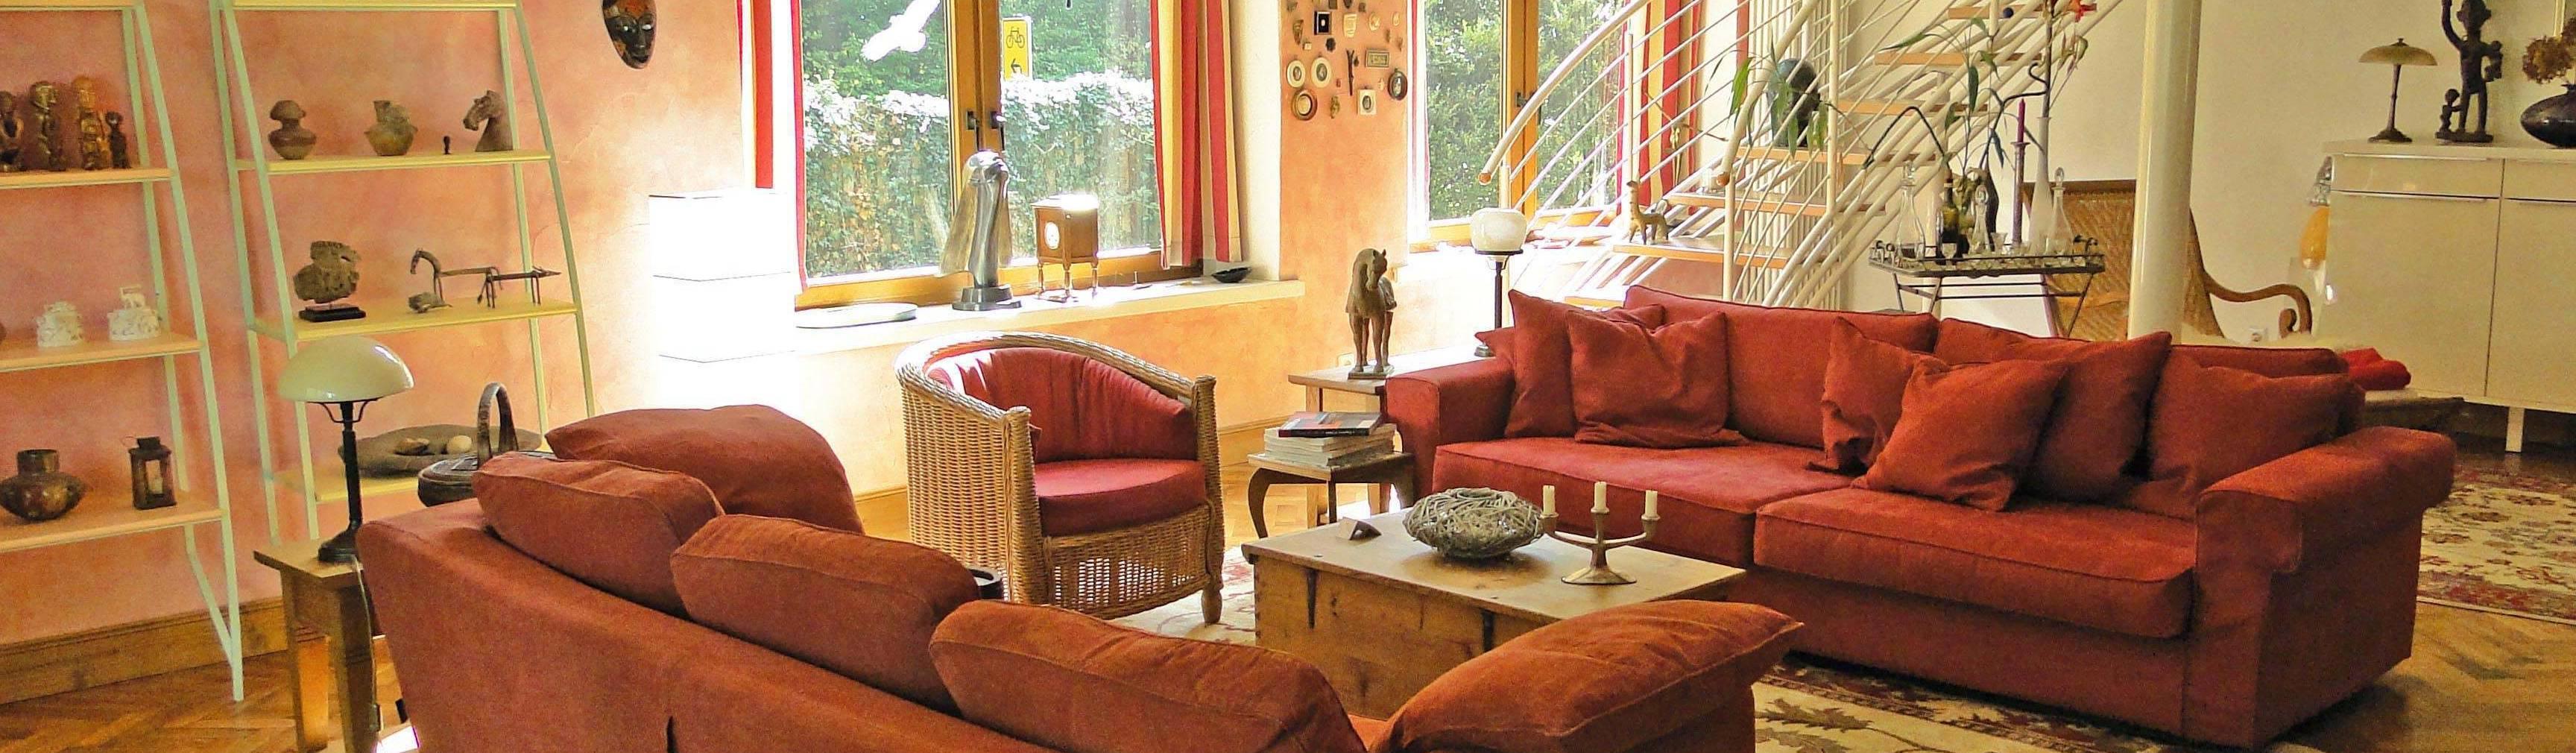 badezimmer familie aus lippstadt von b a r b a r a v o l m e r interieur design homify. Black Bedroom Furniture Sets. Home Design Ideas